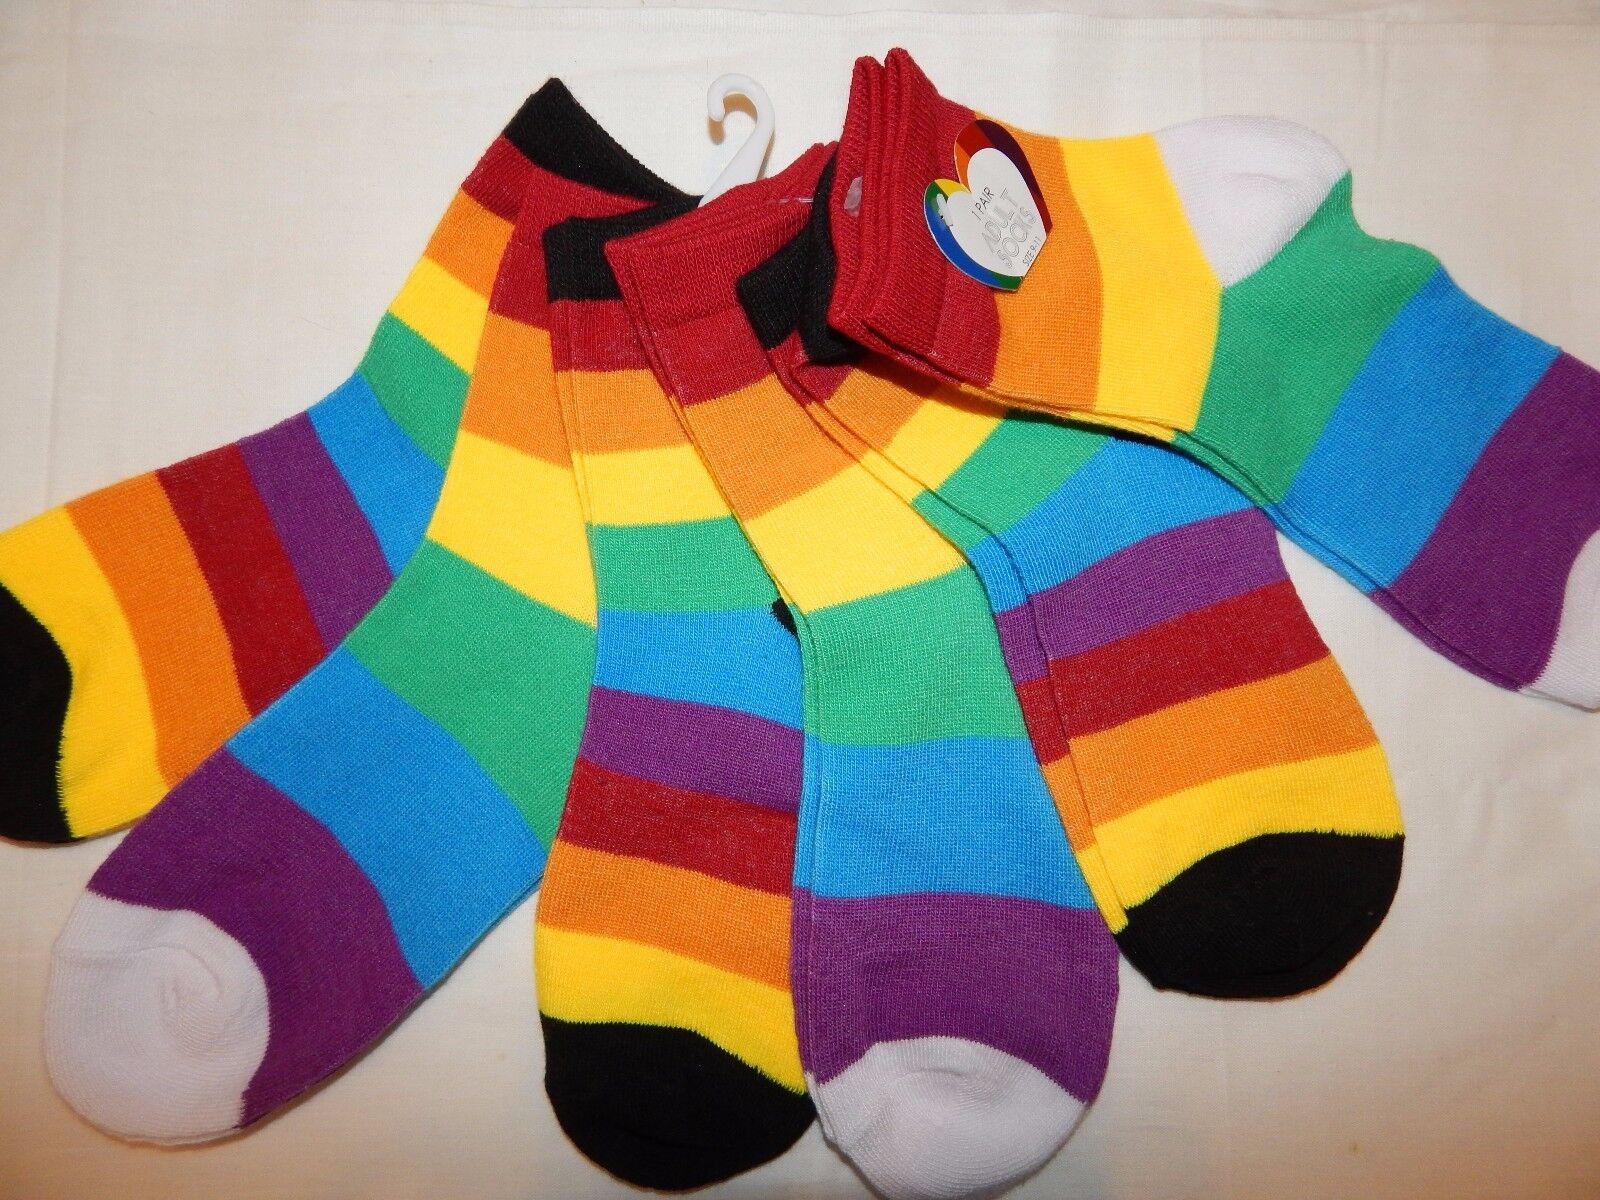 6 Pair Socks 9-11 Adult Rainbow Striped Red Yellow Purple Pr